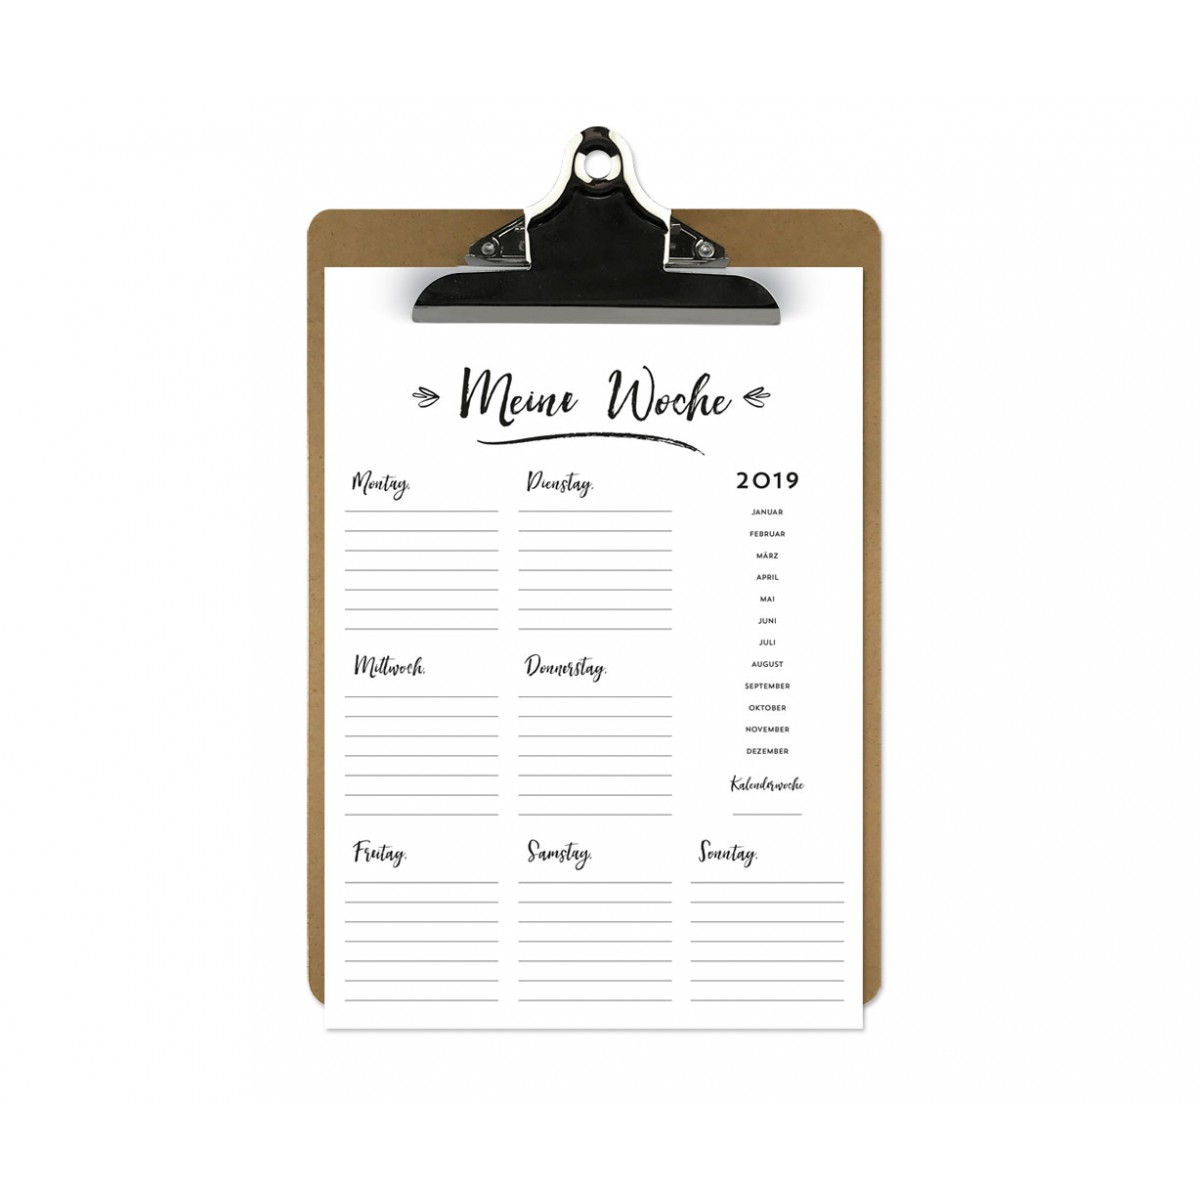 Handlettering Wochenplaner Kalender Klemmbrett / Mint